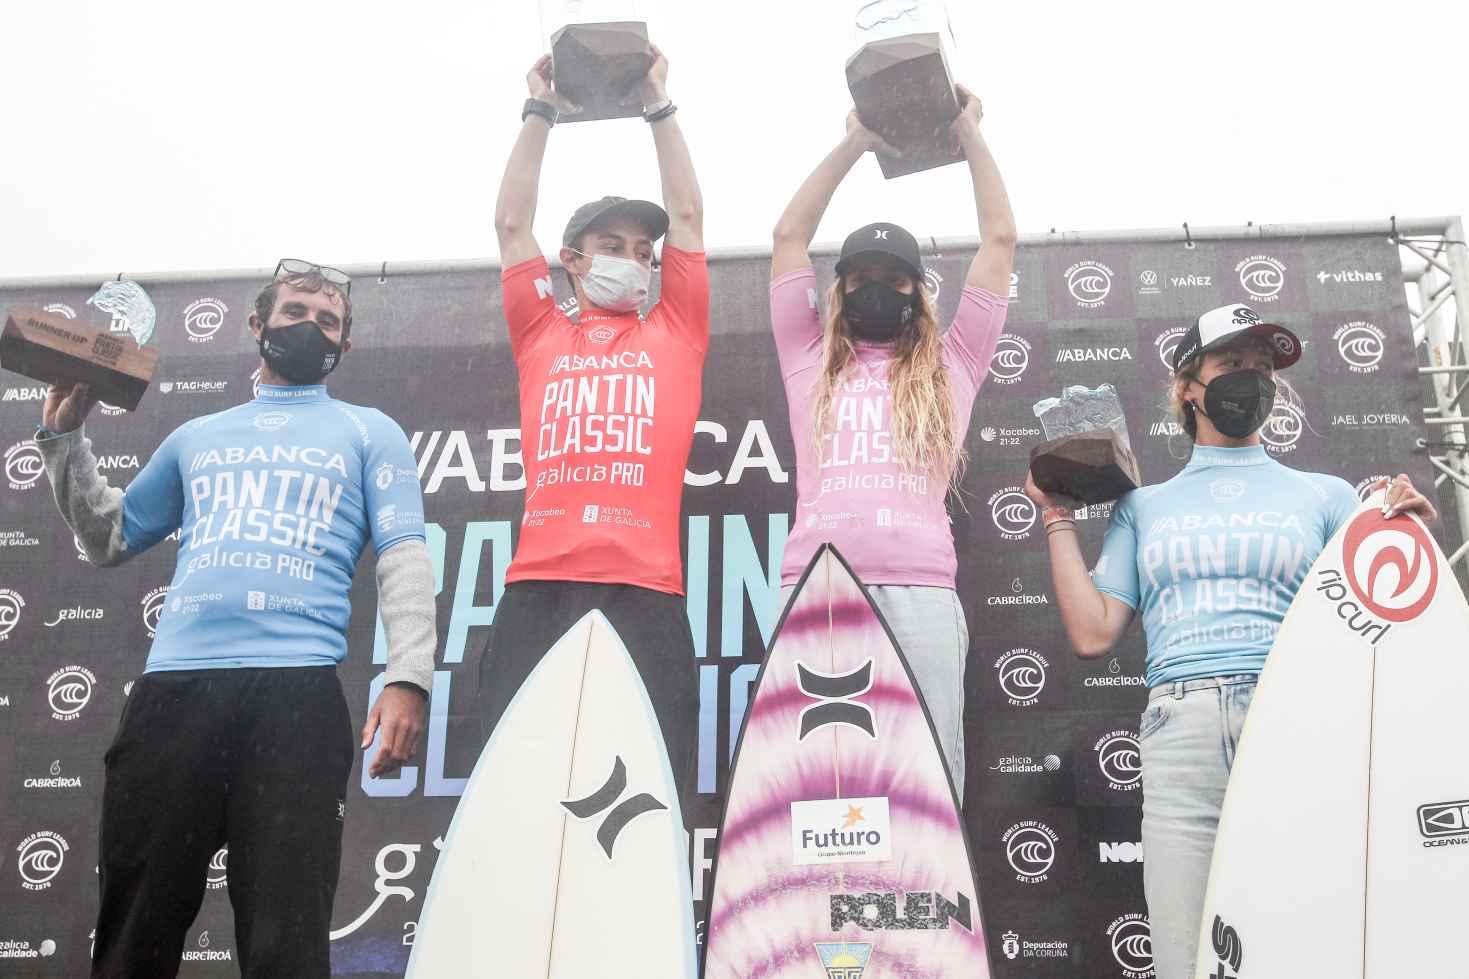 surf30 pantin classic 2021 wsl surf Adur Amatriain Joan Duru Carolina Mendes Melania Diaz0856PantinClassic2021Masurel